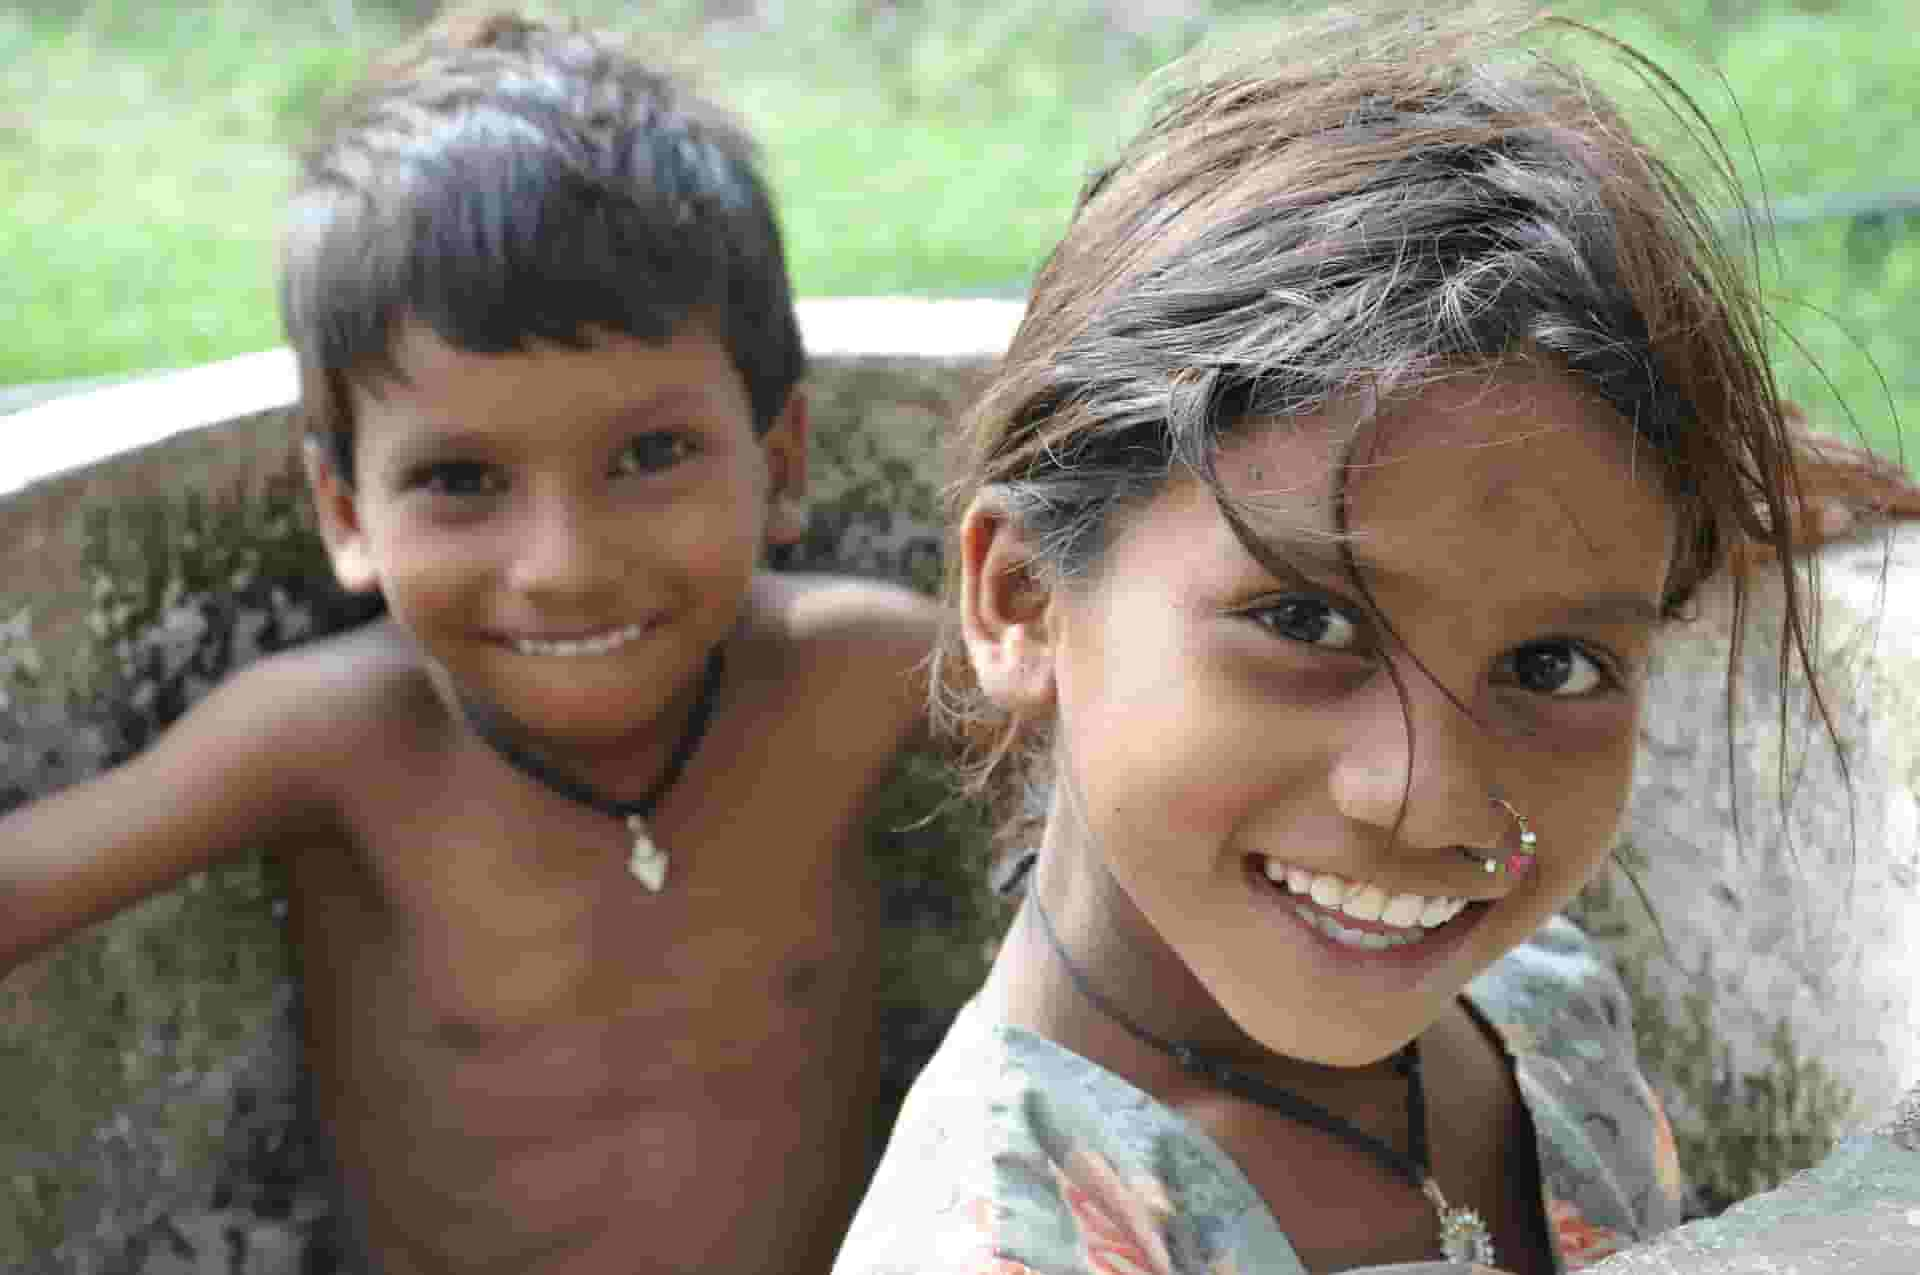 2 sibling Smiling